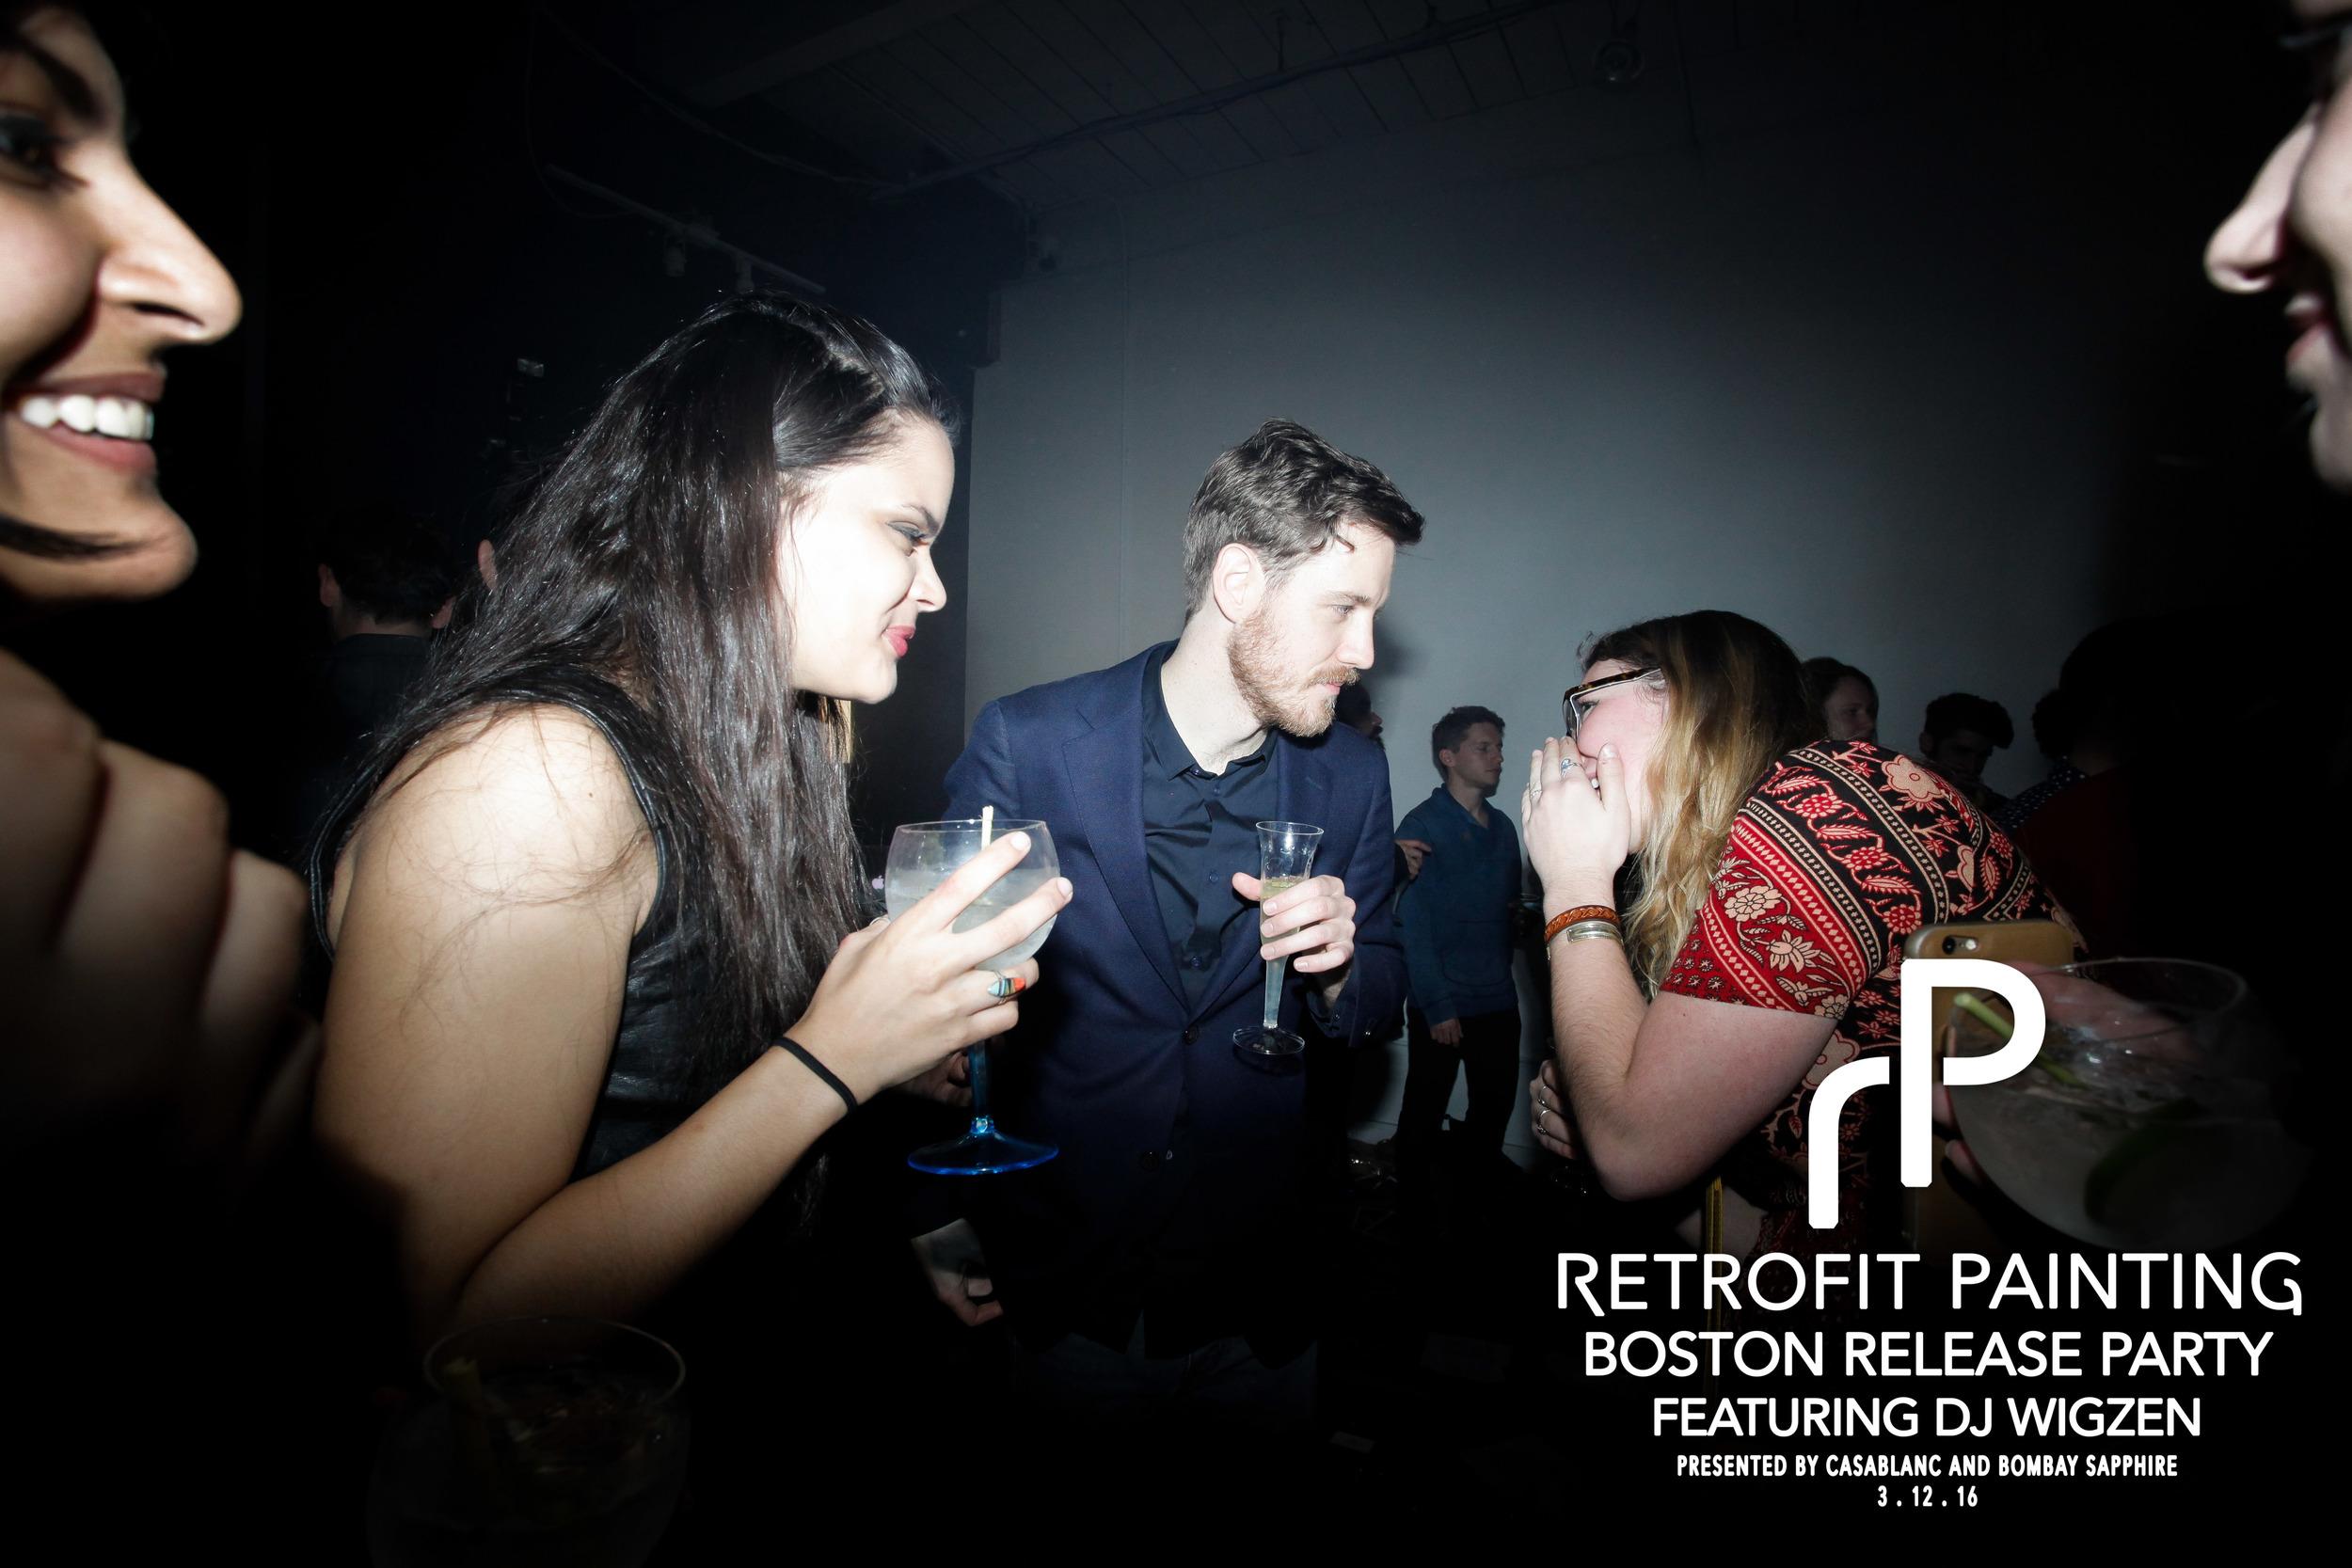 Retrofit Painting Boston Release Party 0111.jpg